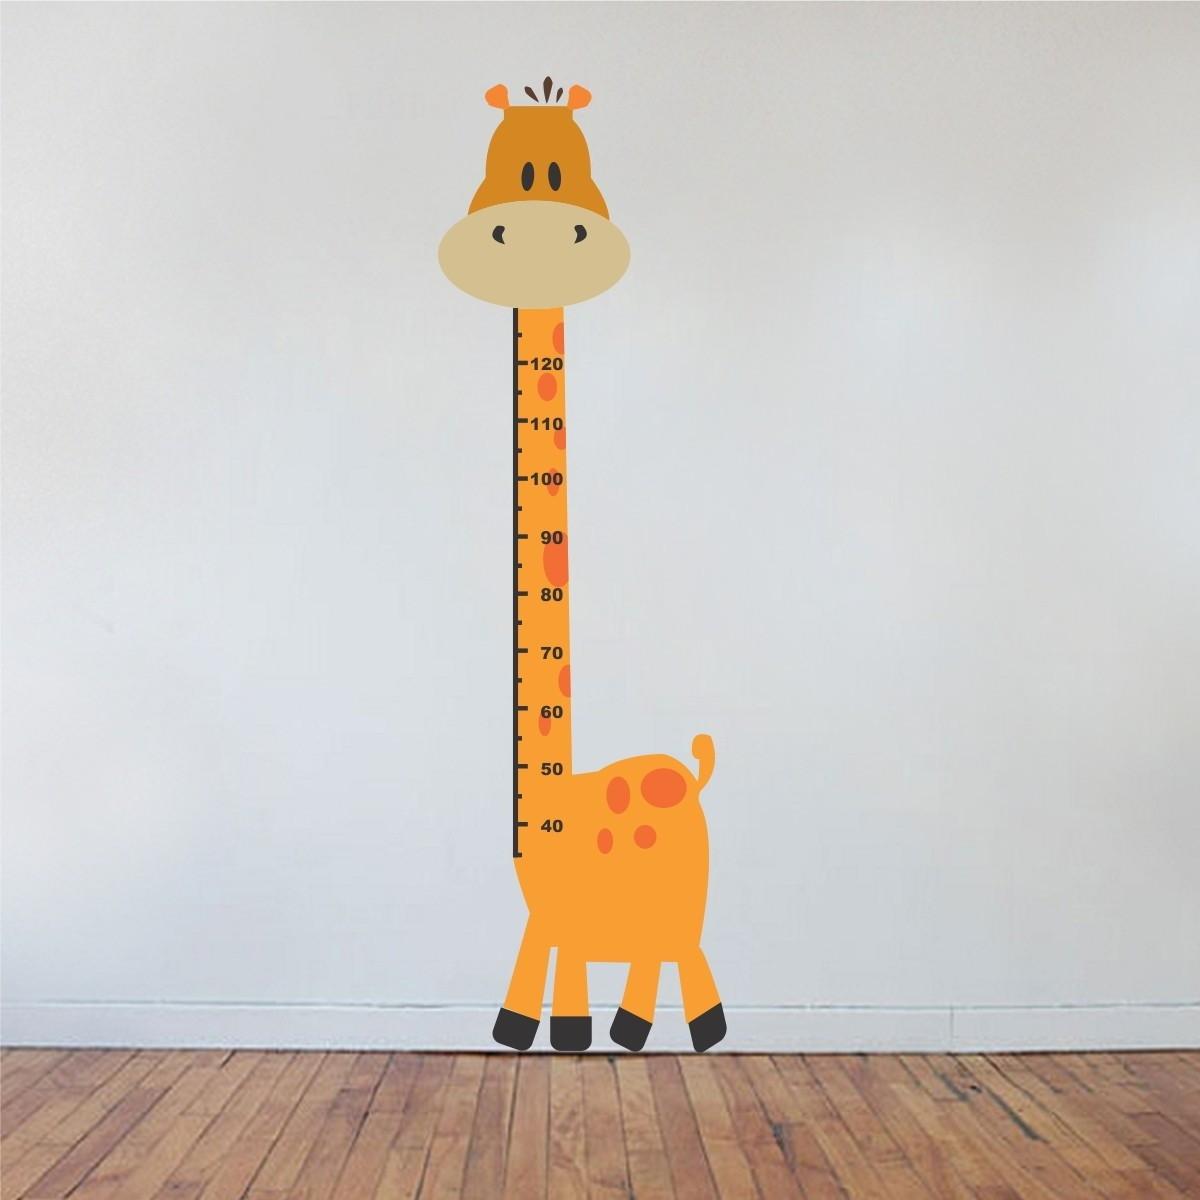 Adesivo Girafa Regua Metrica Infantil No Elo7